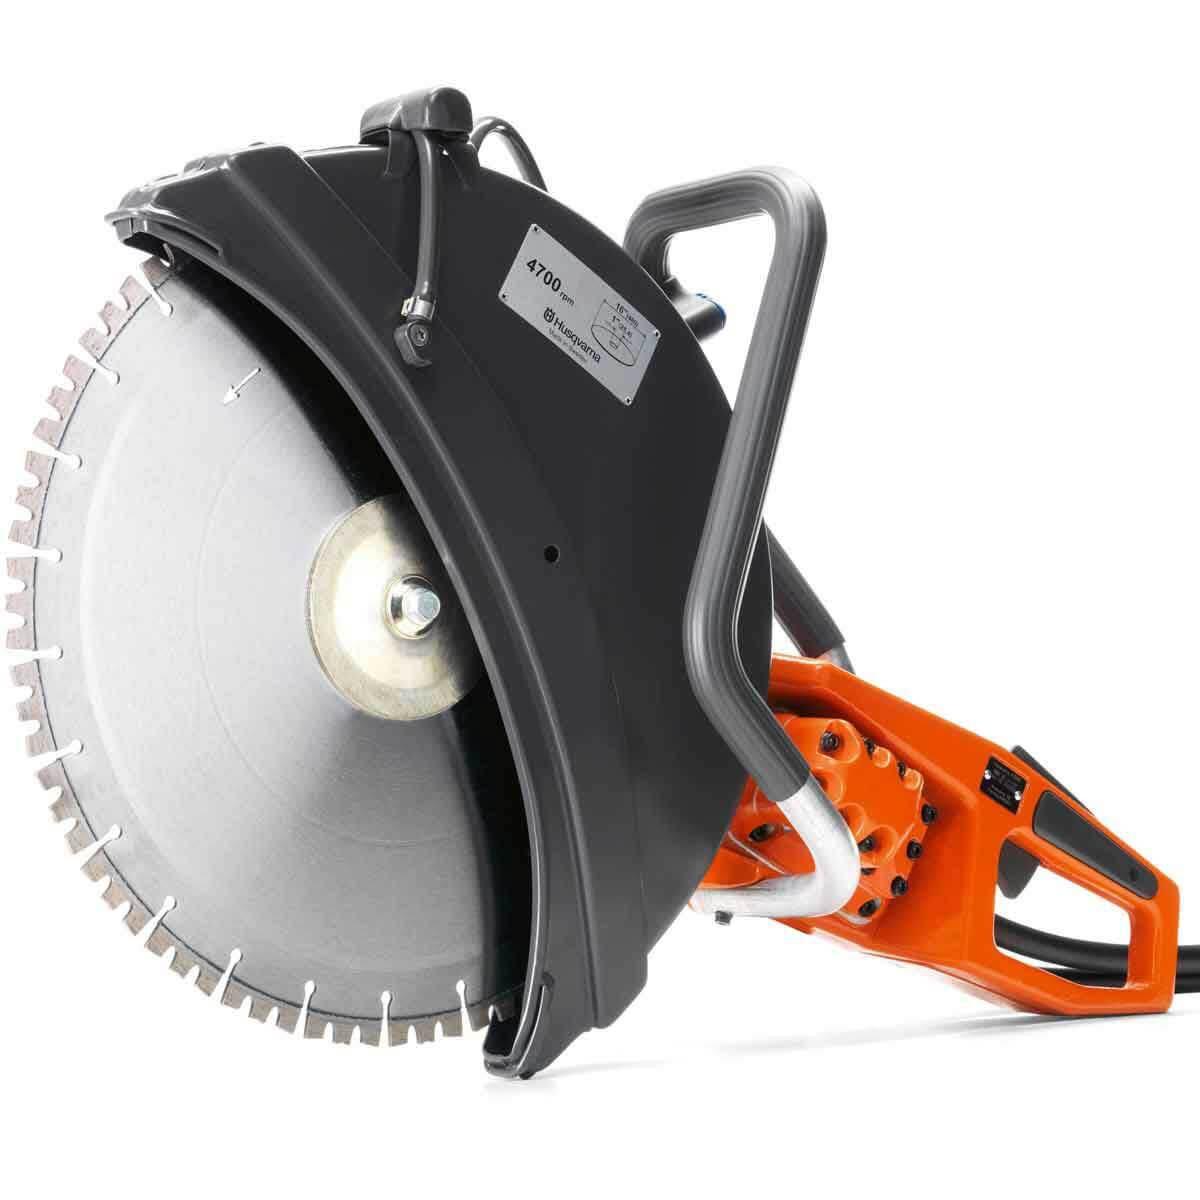 Husqvarna K2500 Hydraulic saw